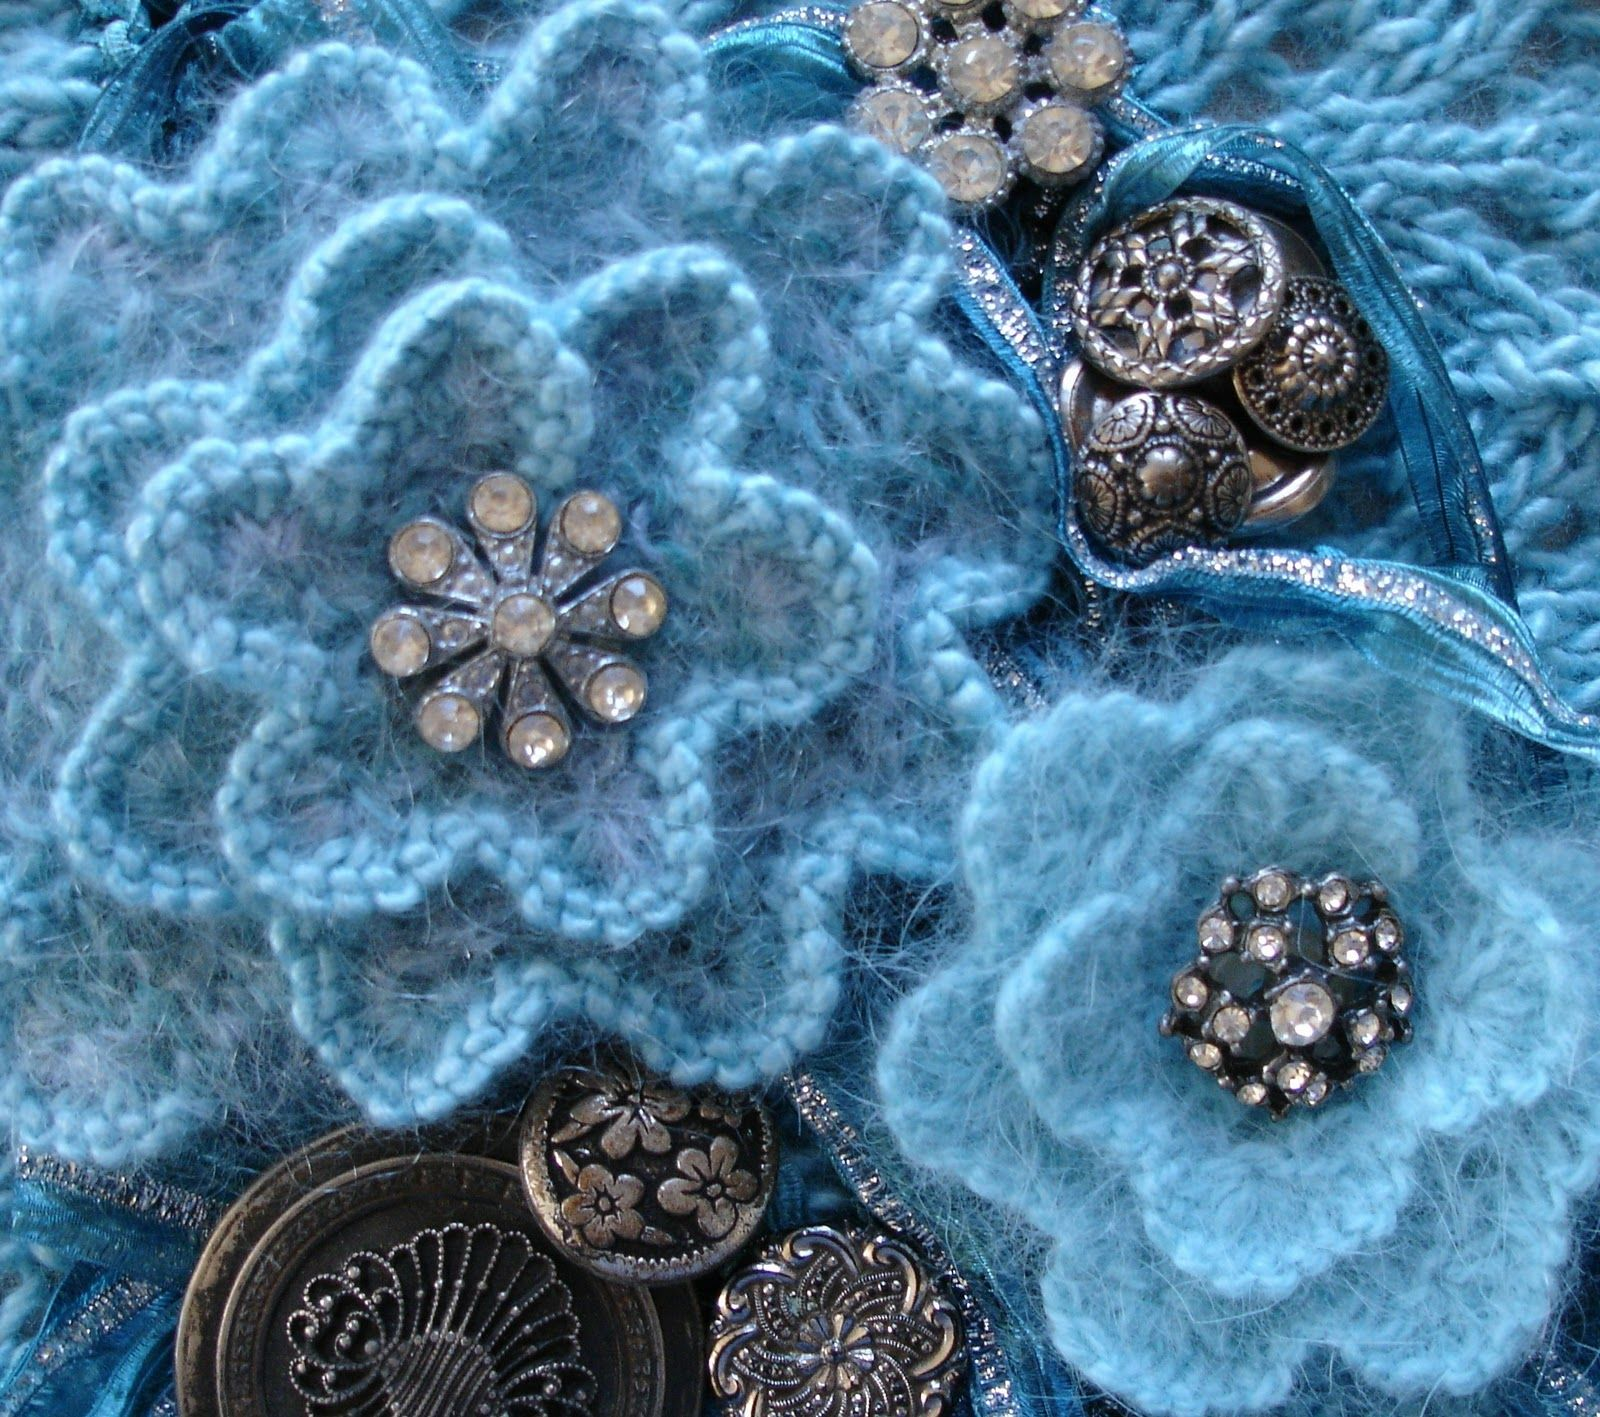 Knitting in the Details - Louisa Harding